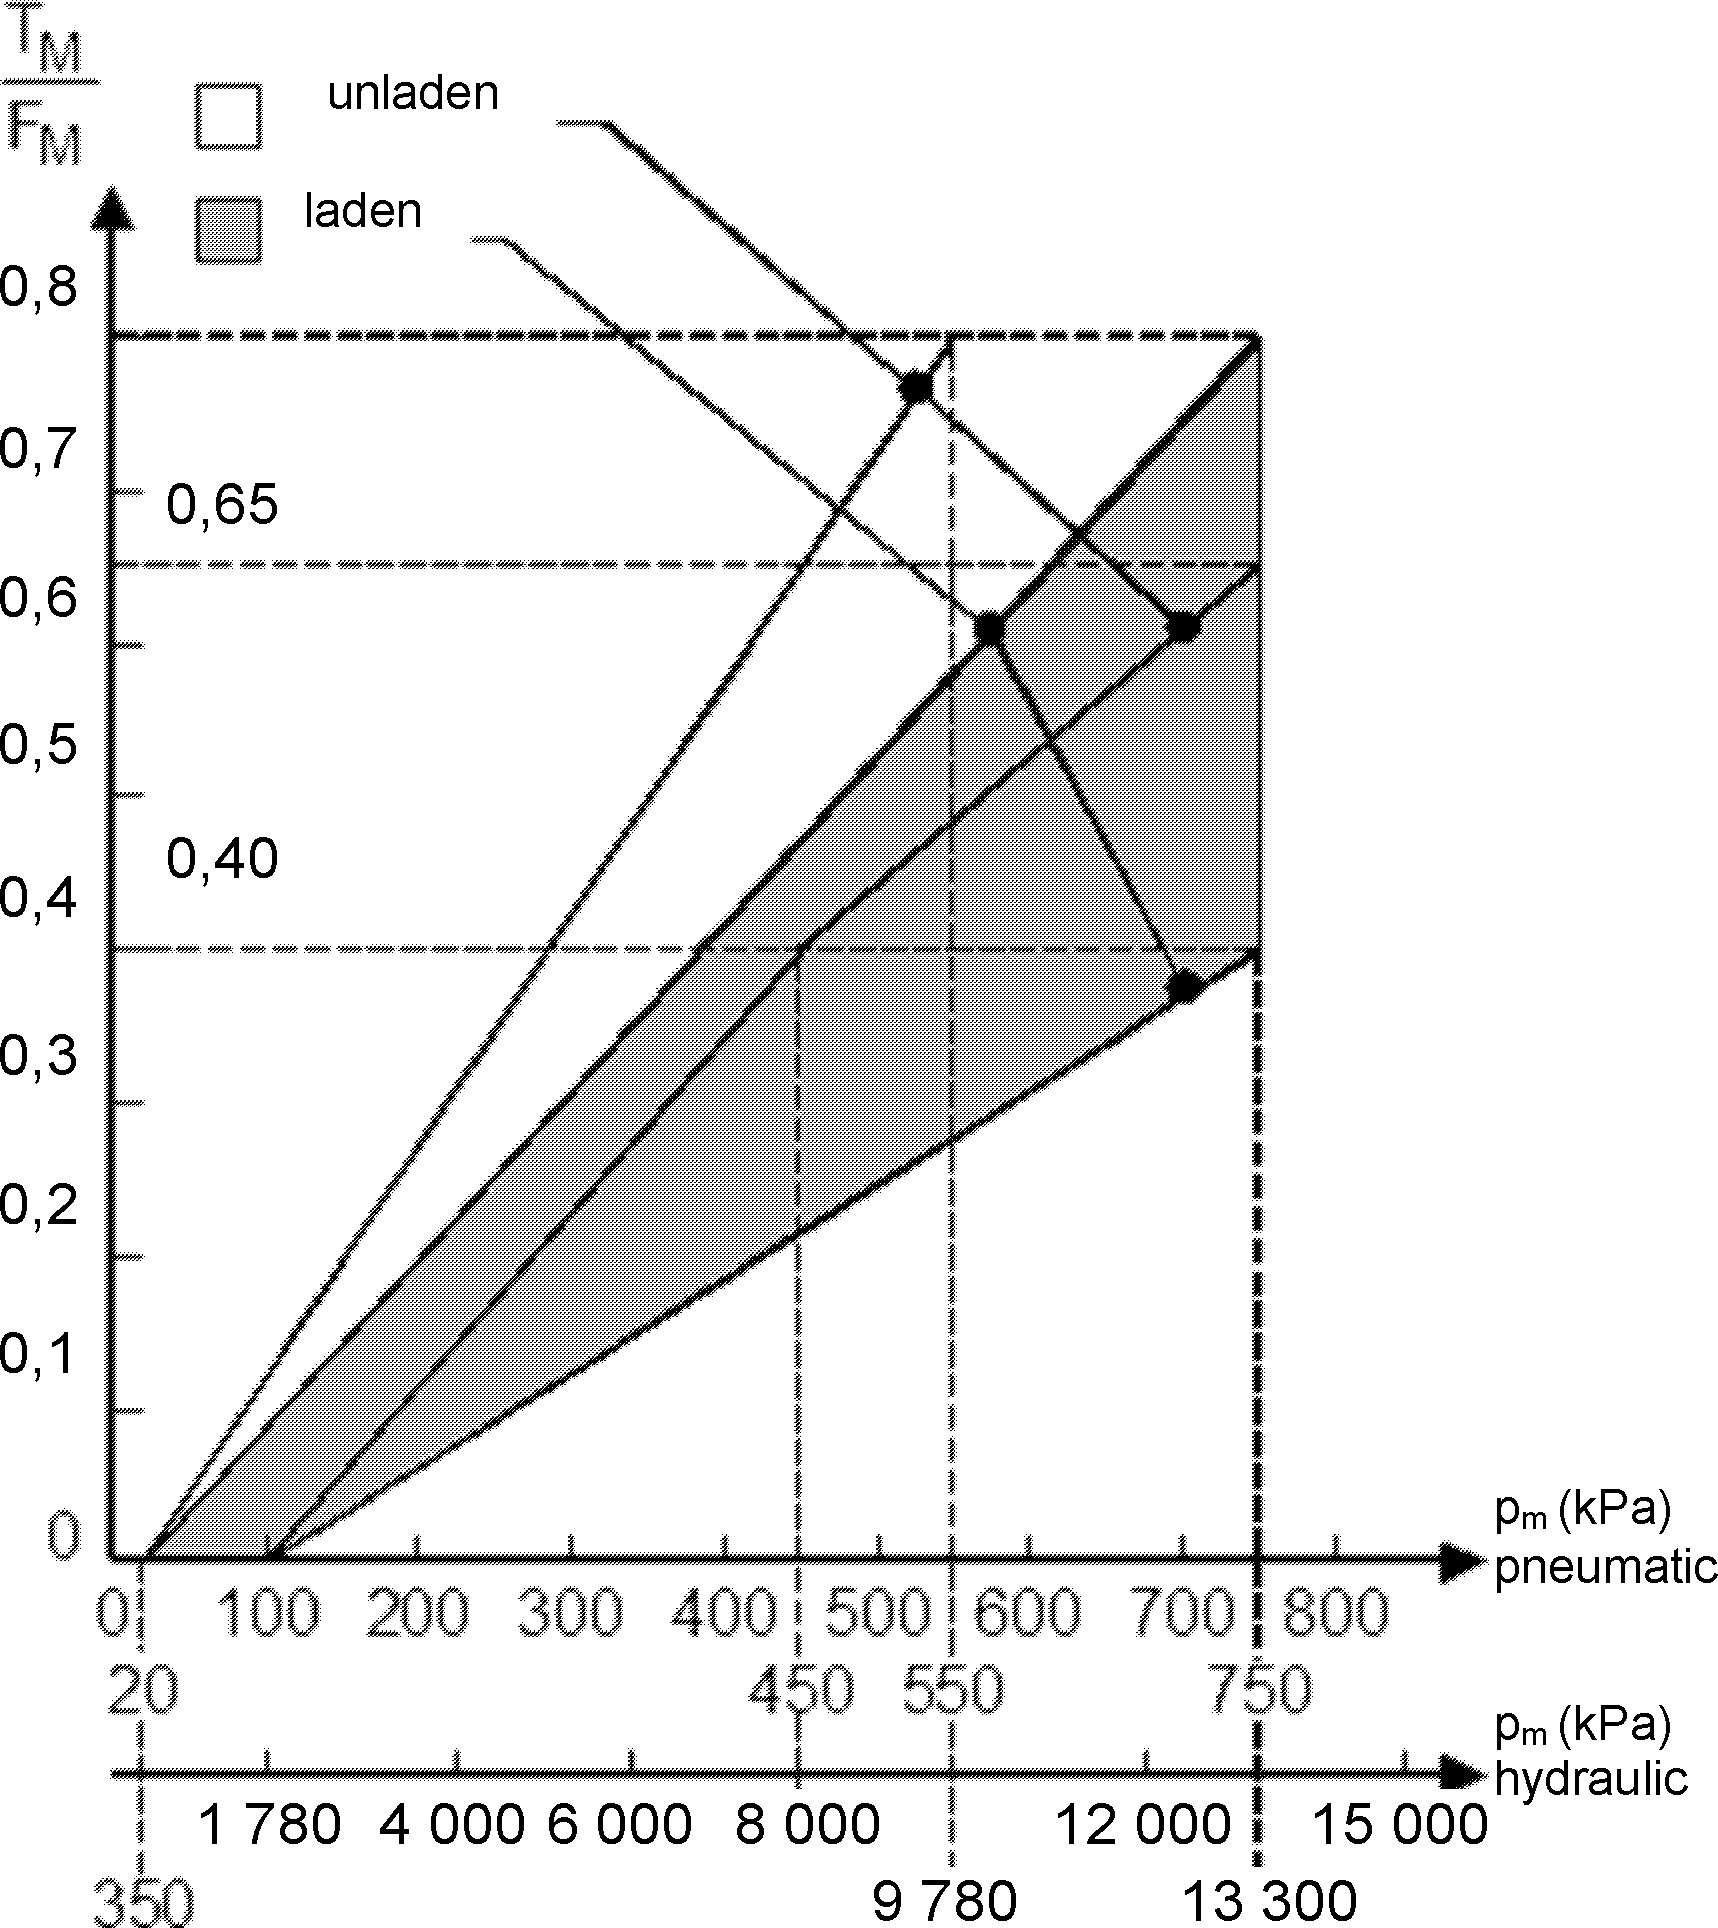 Eur Lex 02015r0068 20161014 En Four Diagrams A B C And D Representing Stages Of Stroke Diagram 3